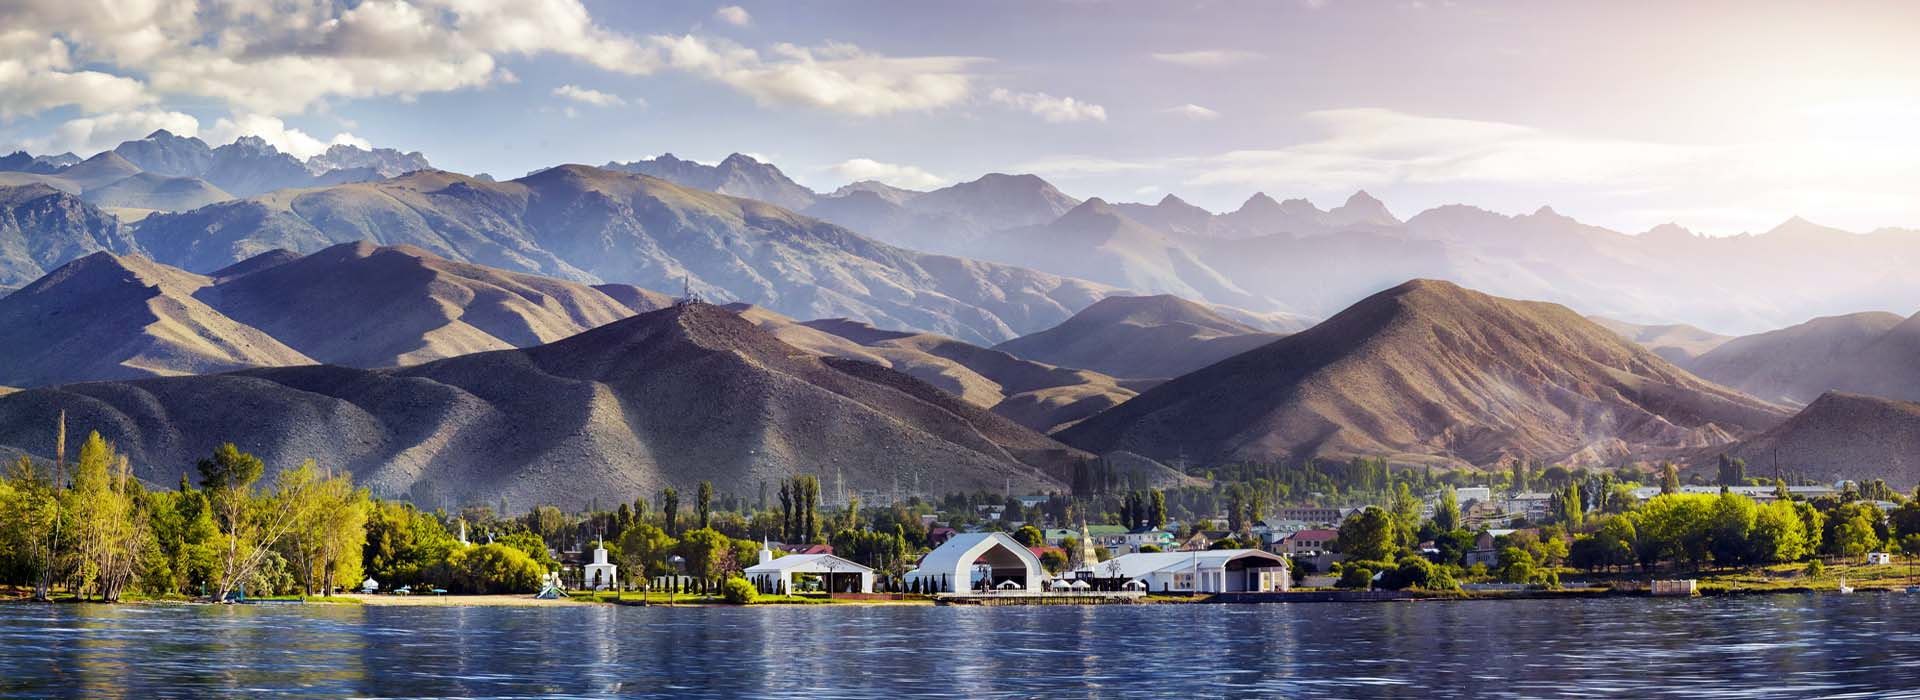 Issyk Kul Kyrgyzstan Tour